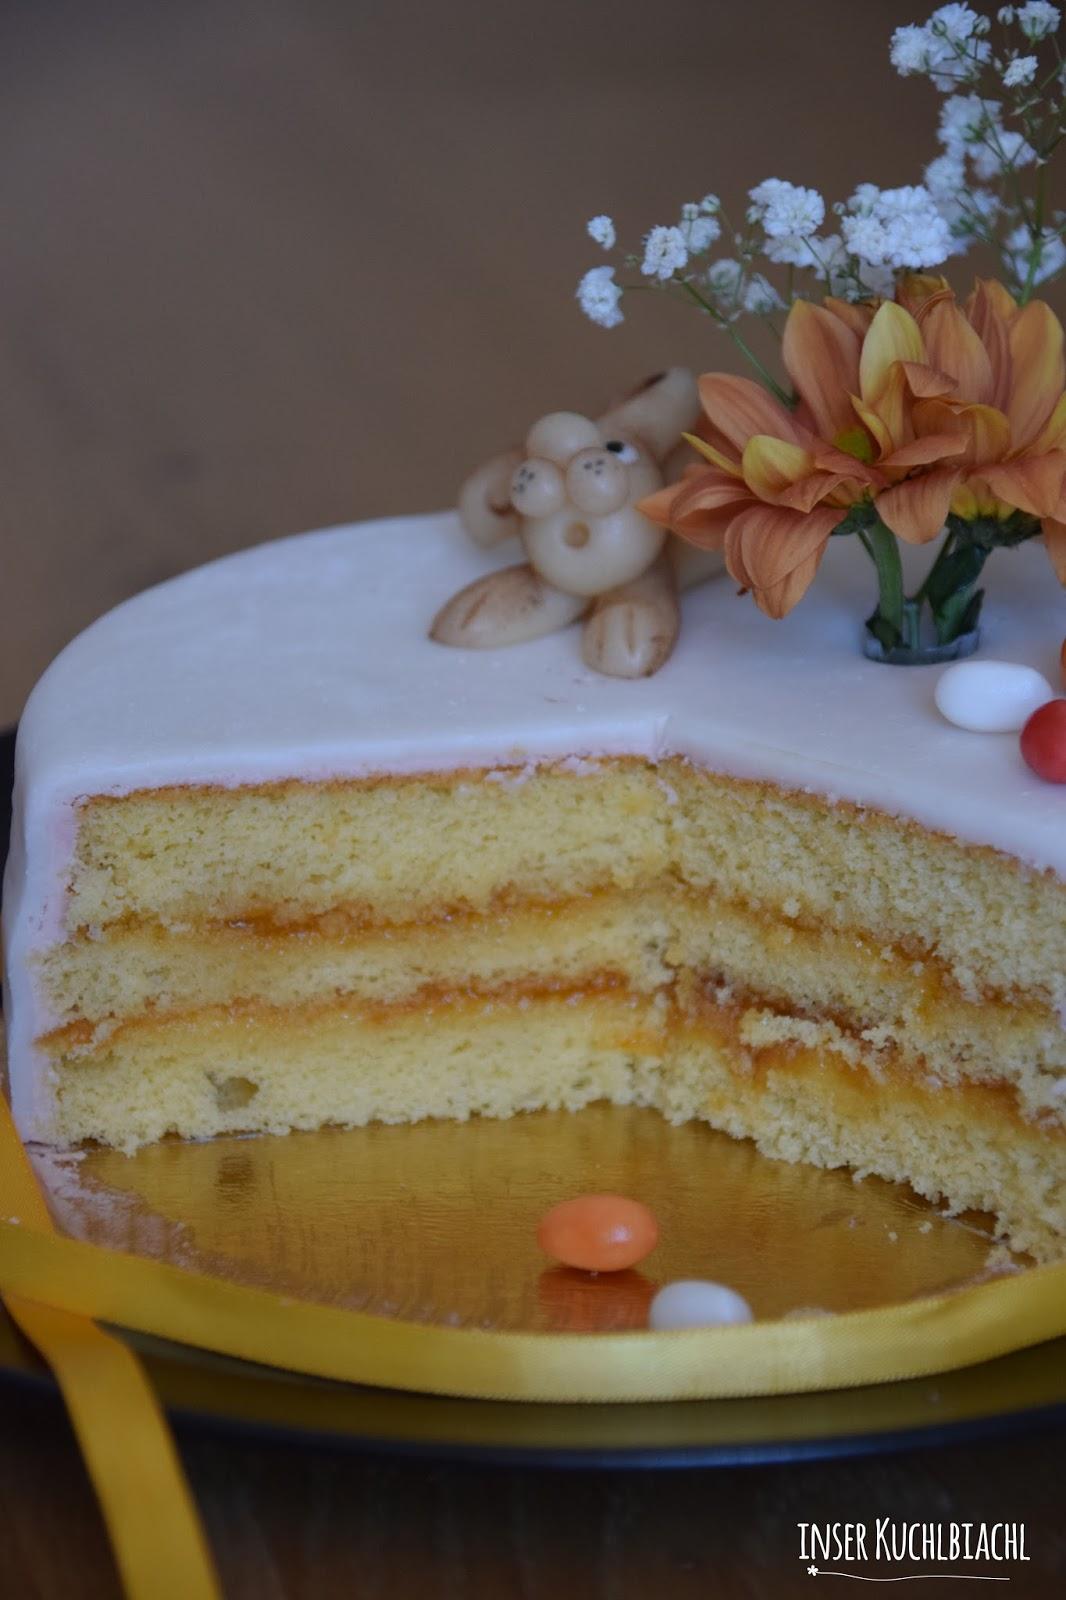 Cake Design Kurs Zurich : inser Kuchlbiachl: Ostertorte aus dem  Cake Design  - Kurs ...